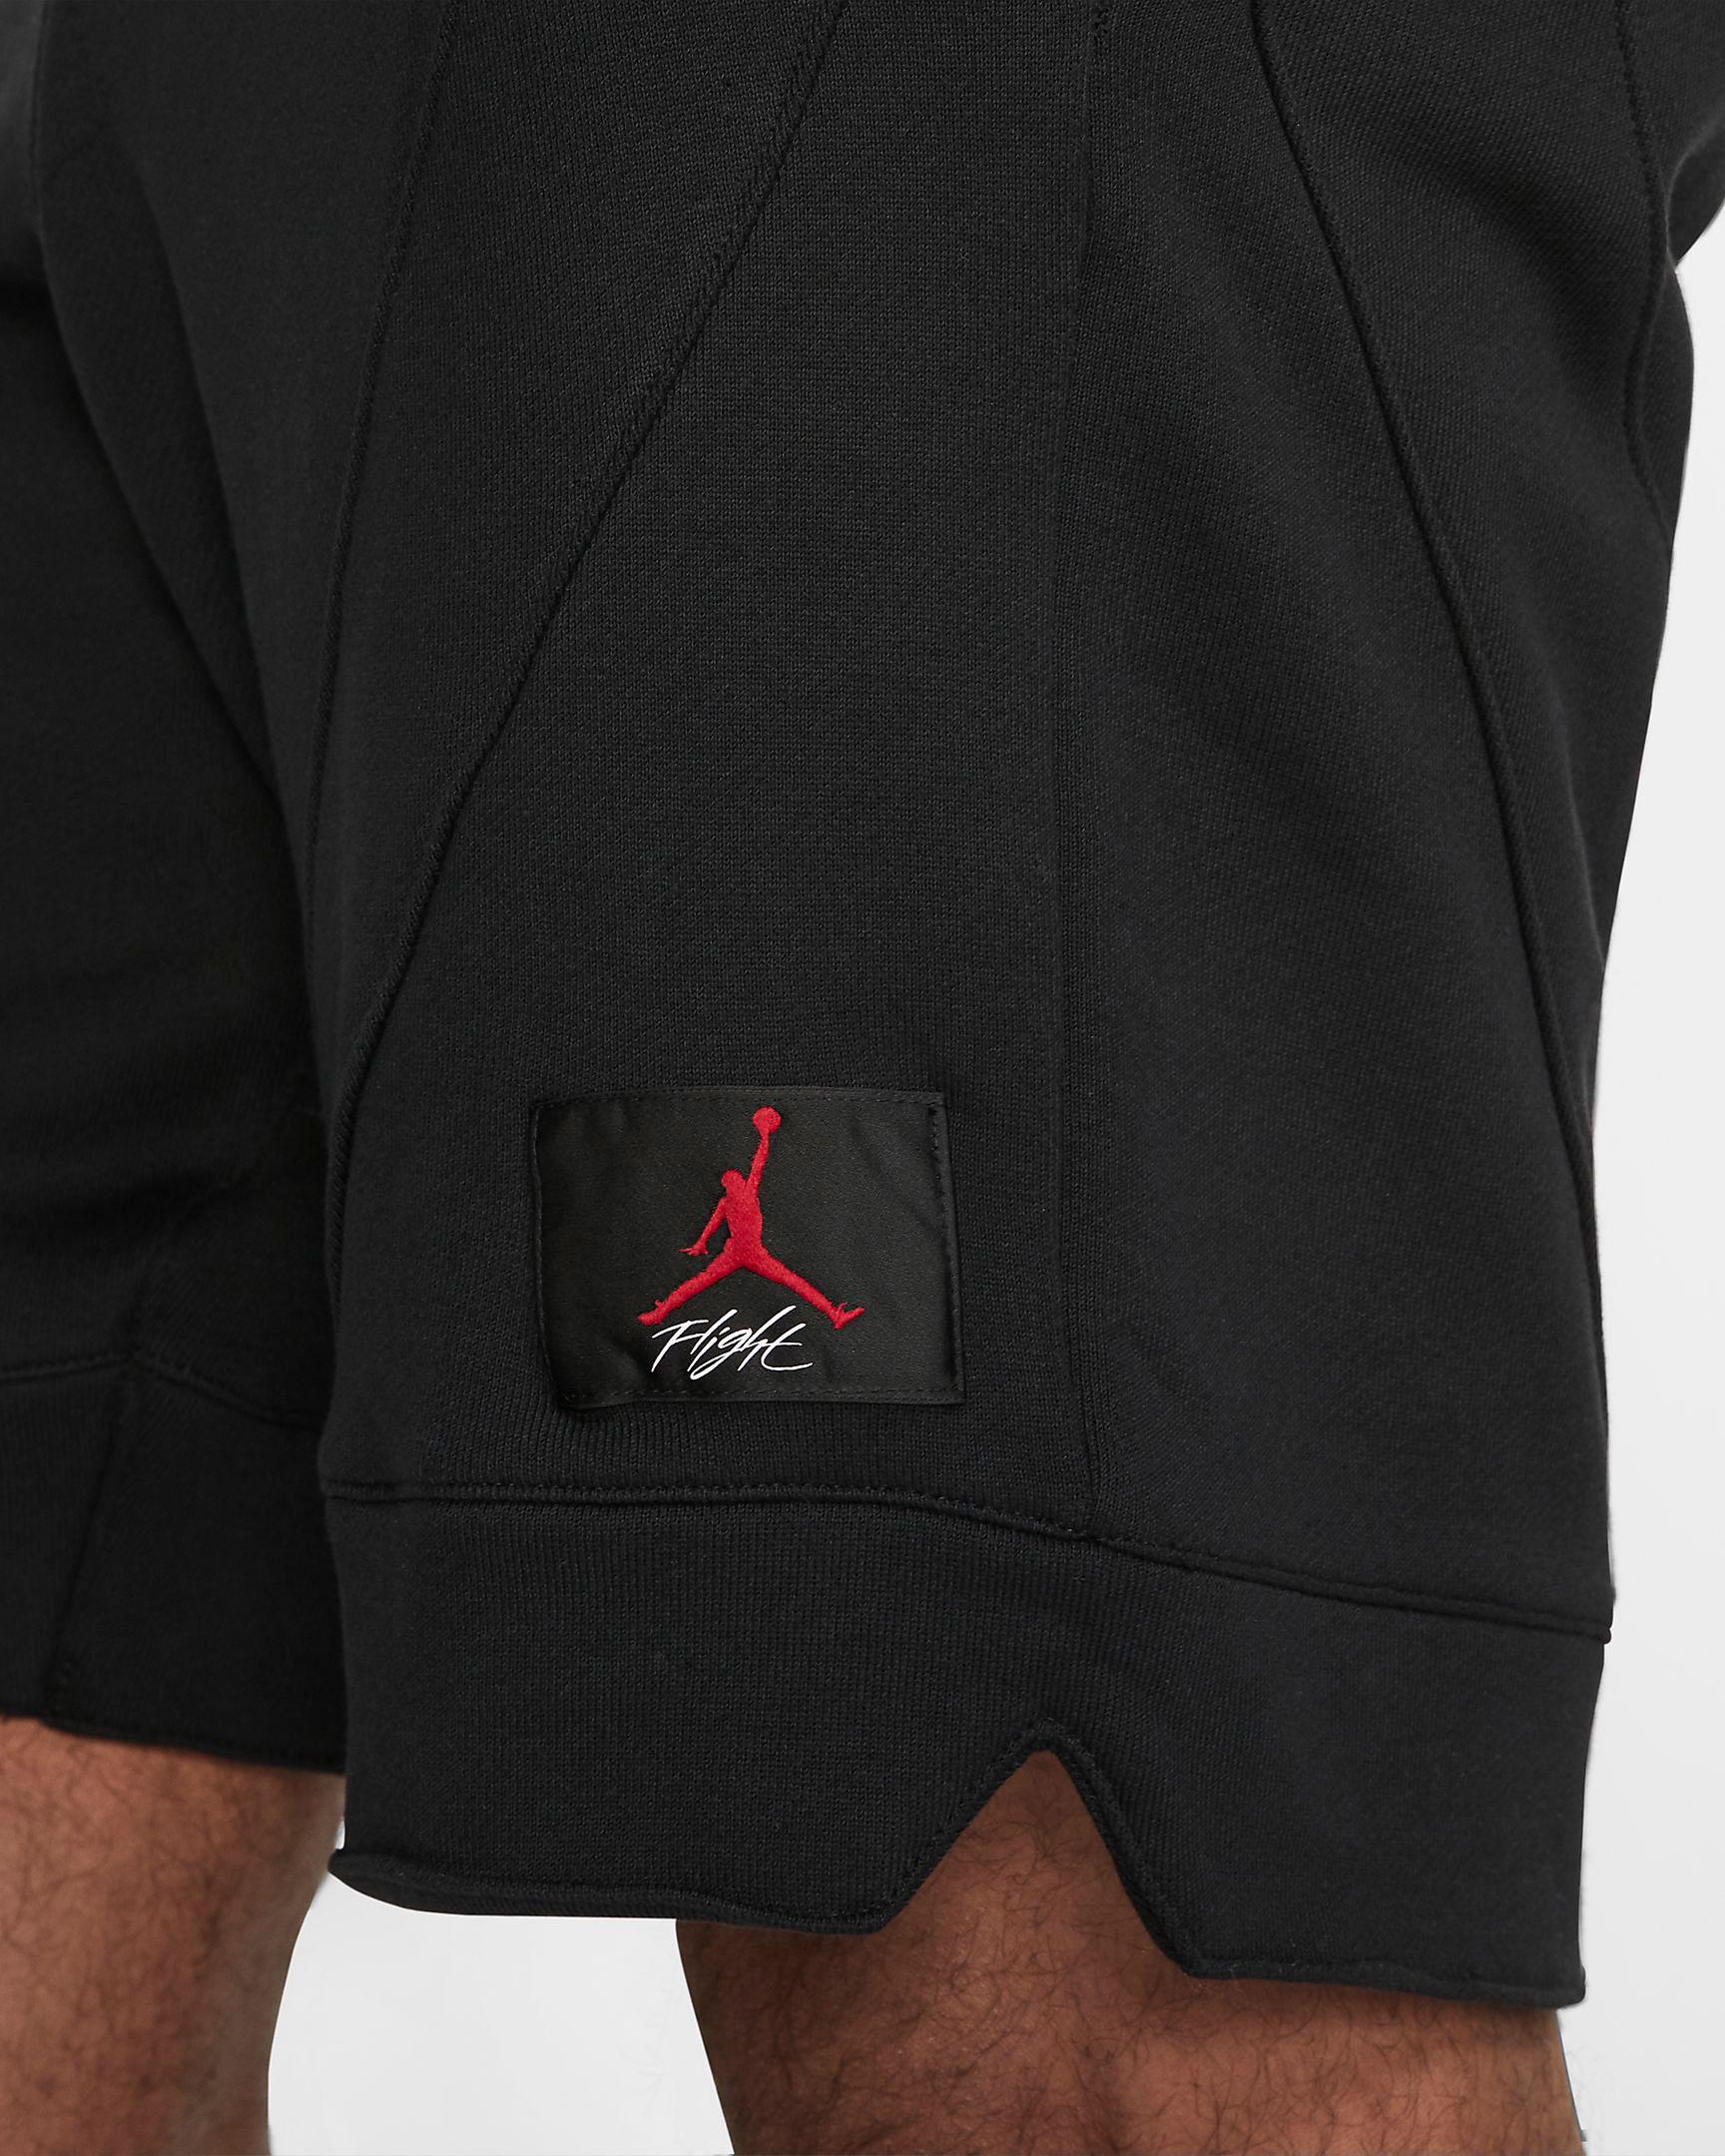 air-jordan-4-bred-shorts-match-1